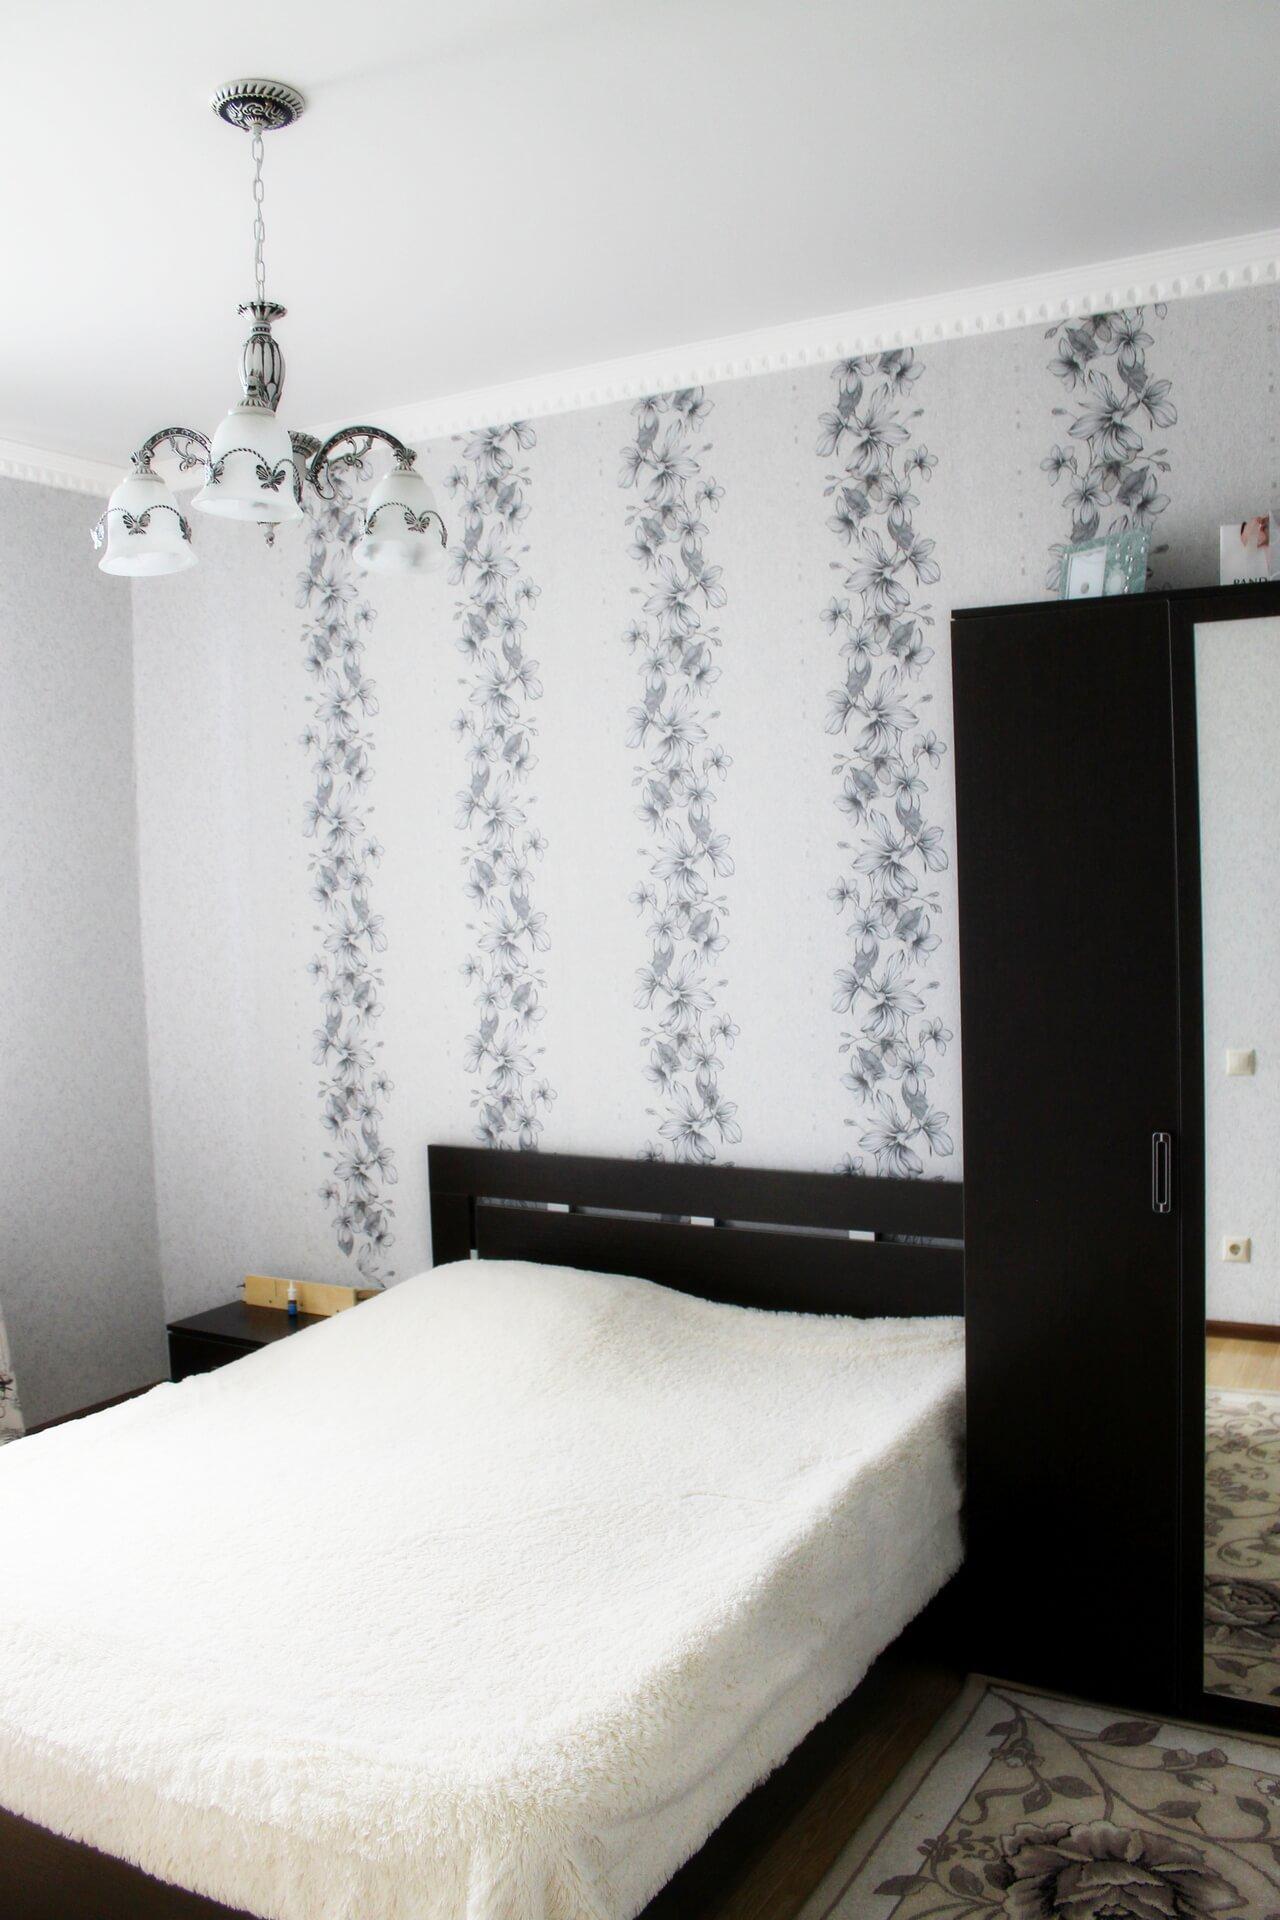 Гостевой дом на улице Веселая - image Gostevoj-dom-v-Adlere-6 on http://bizneskvartal.ru